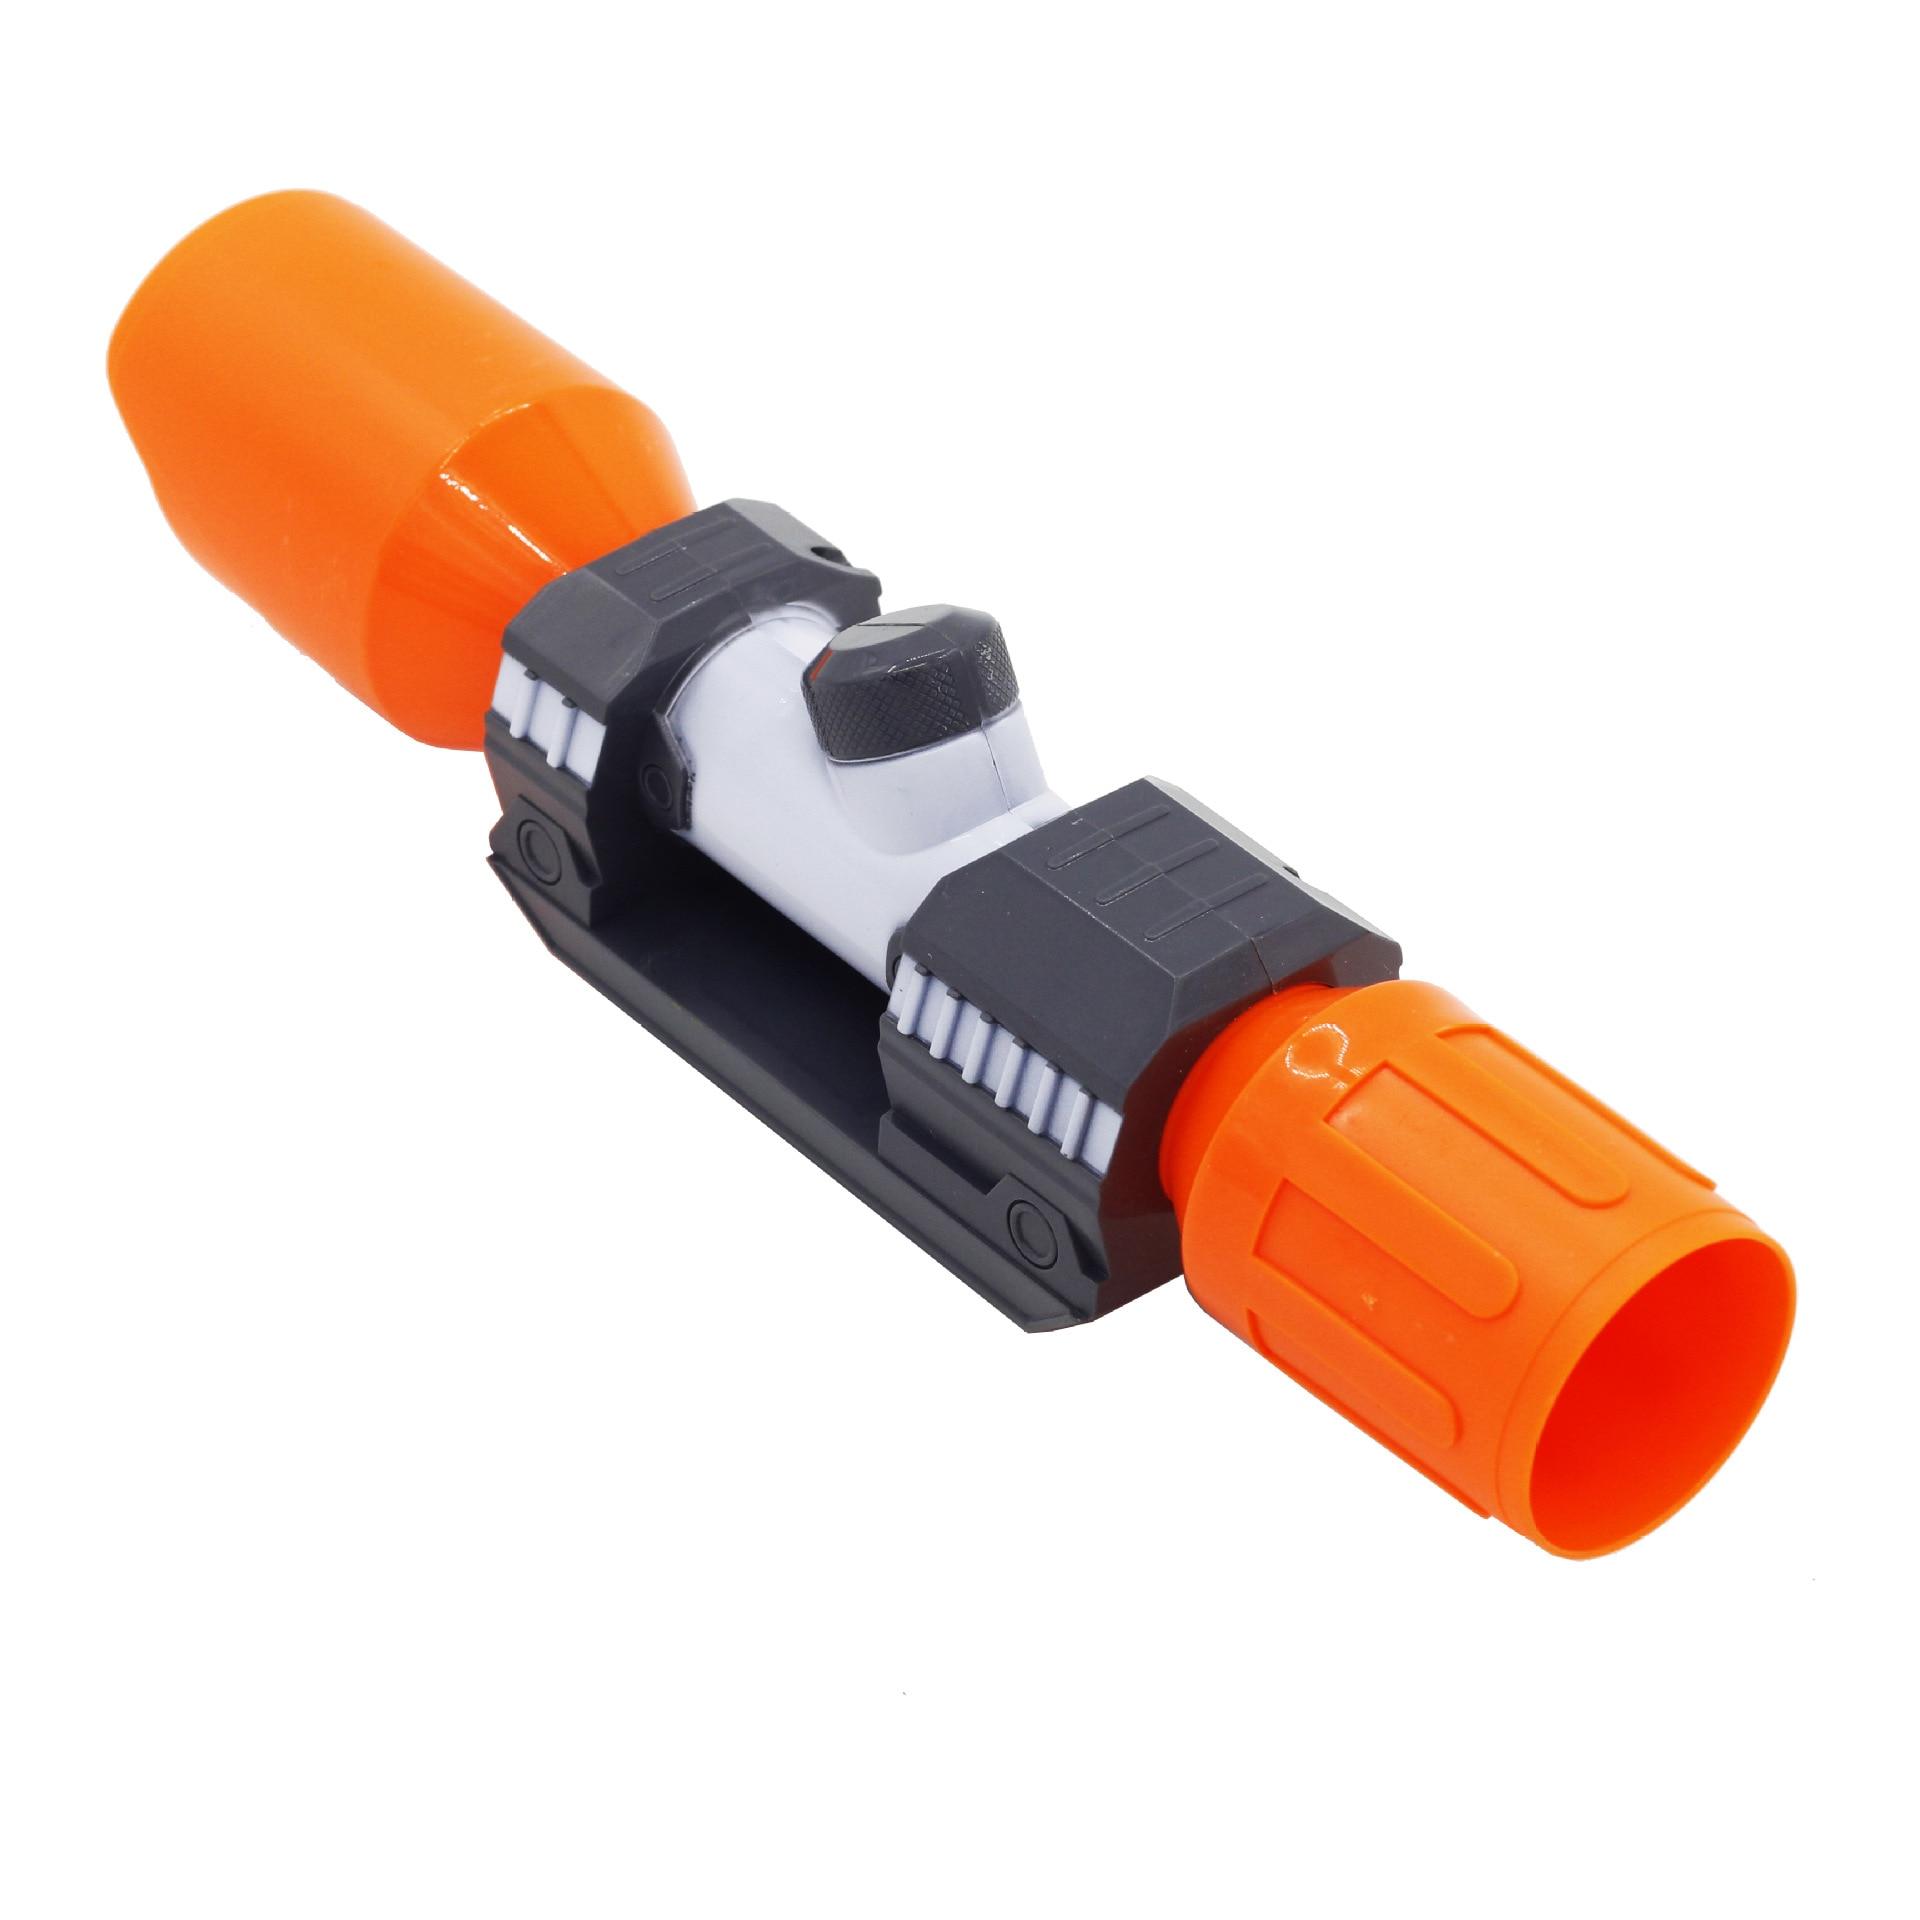 Mira de bala blanda para tubo frontal Universal Compatible con piezas modificadas, dispositivo para observación para la serie Elite 6,4x4,5x23,5 cm